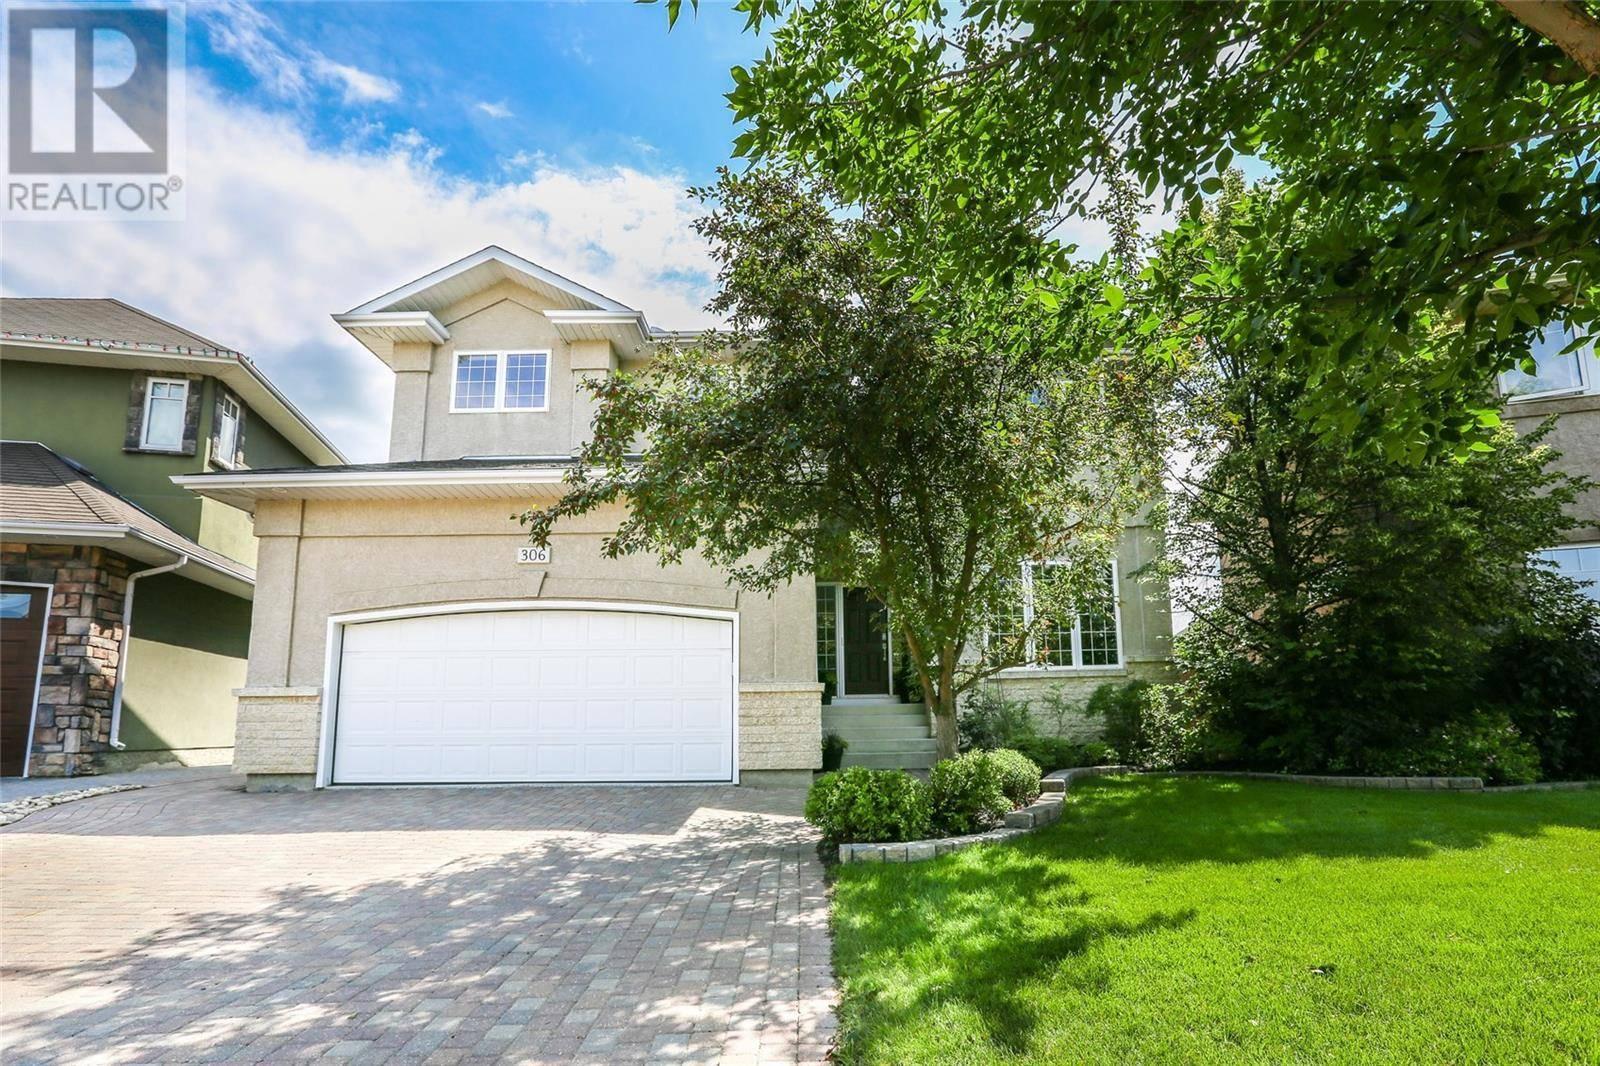 House for sale at 306 Wright Ct Saskatoon Saskatchewan - MLS: SK782292